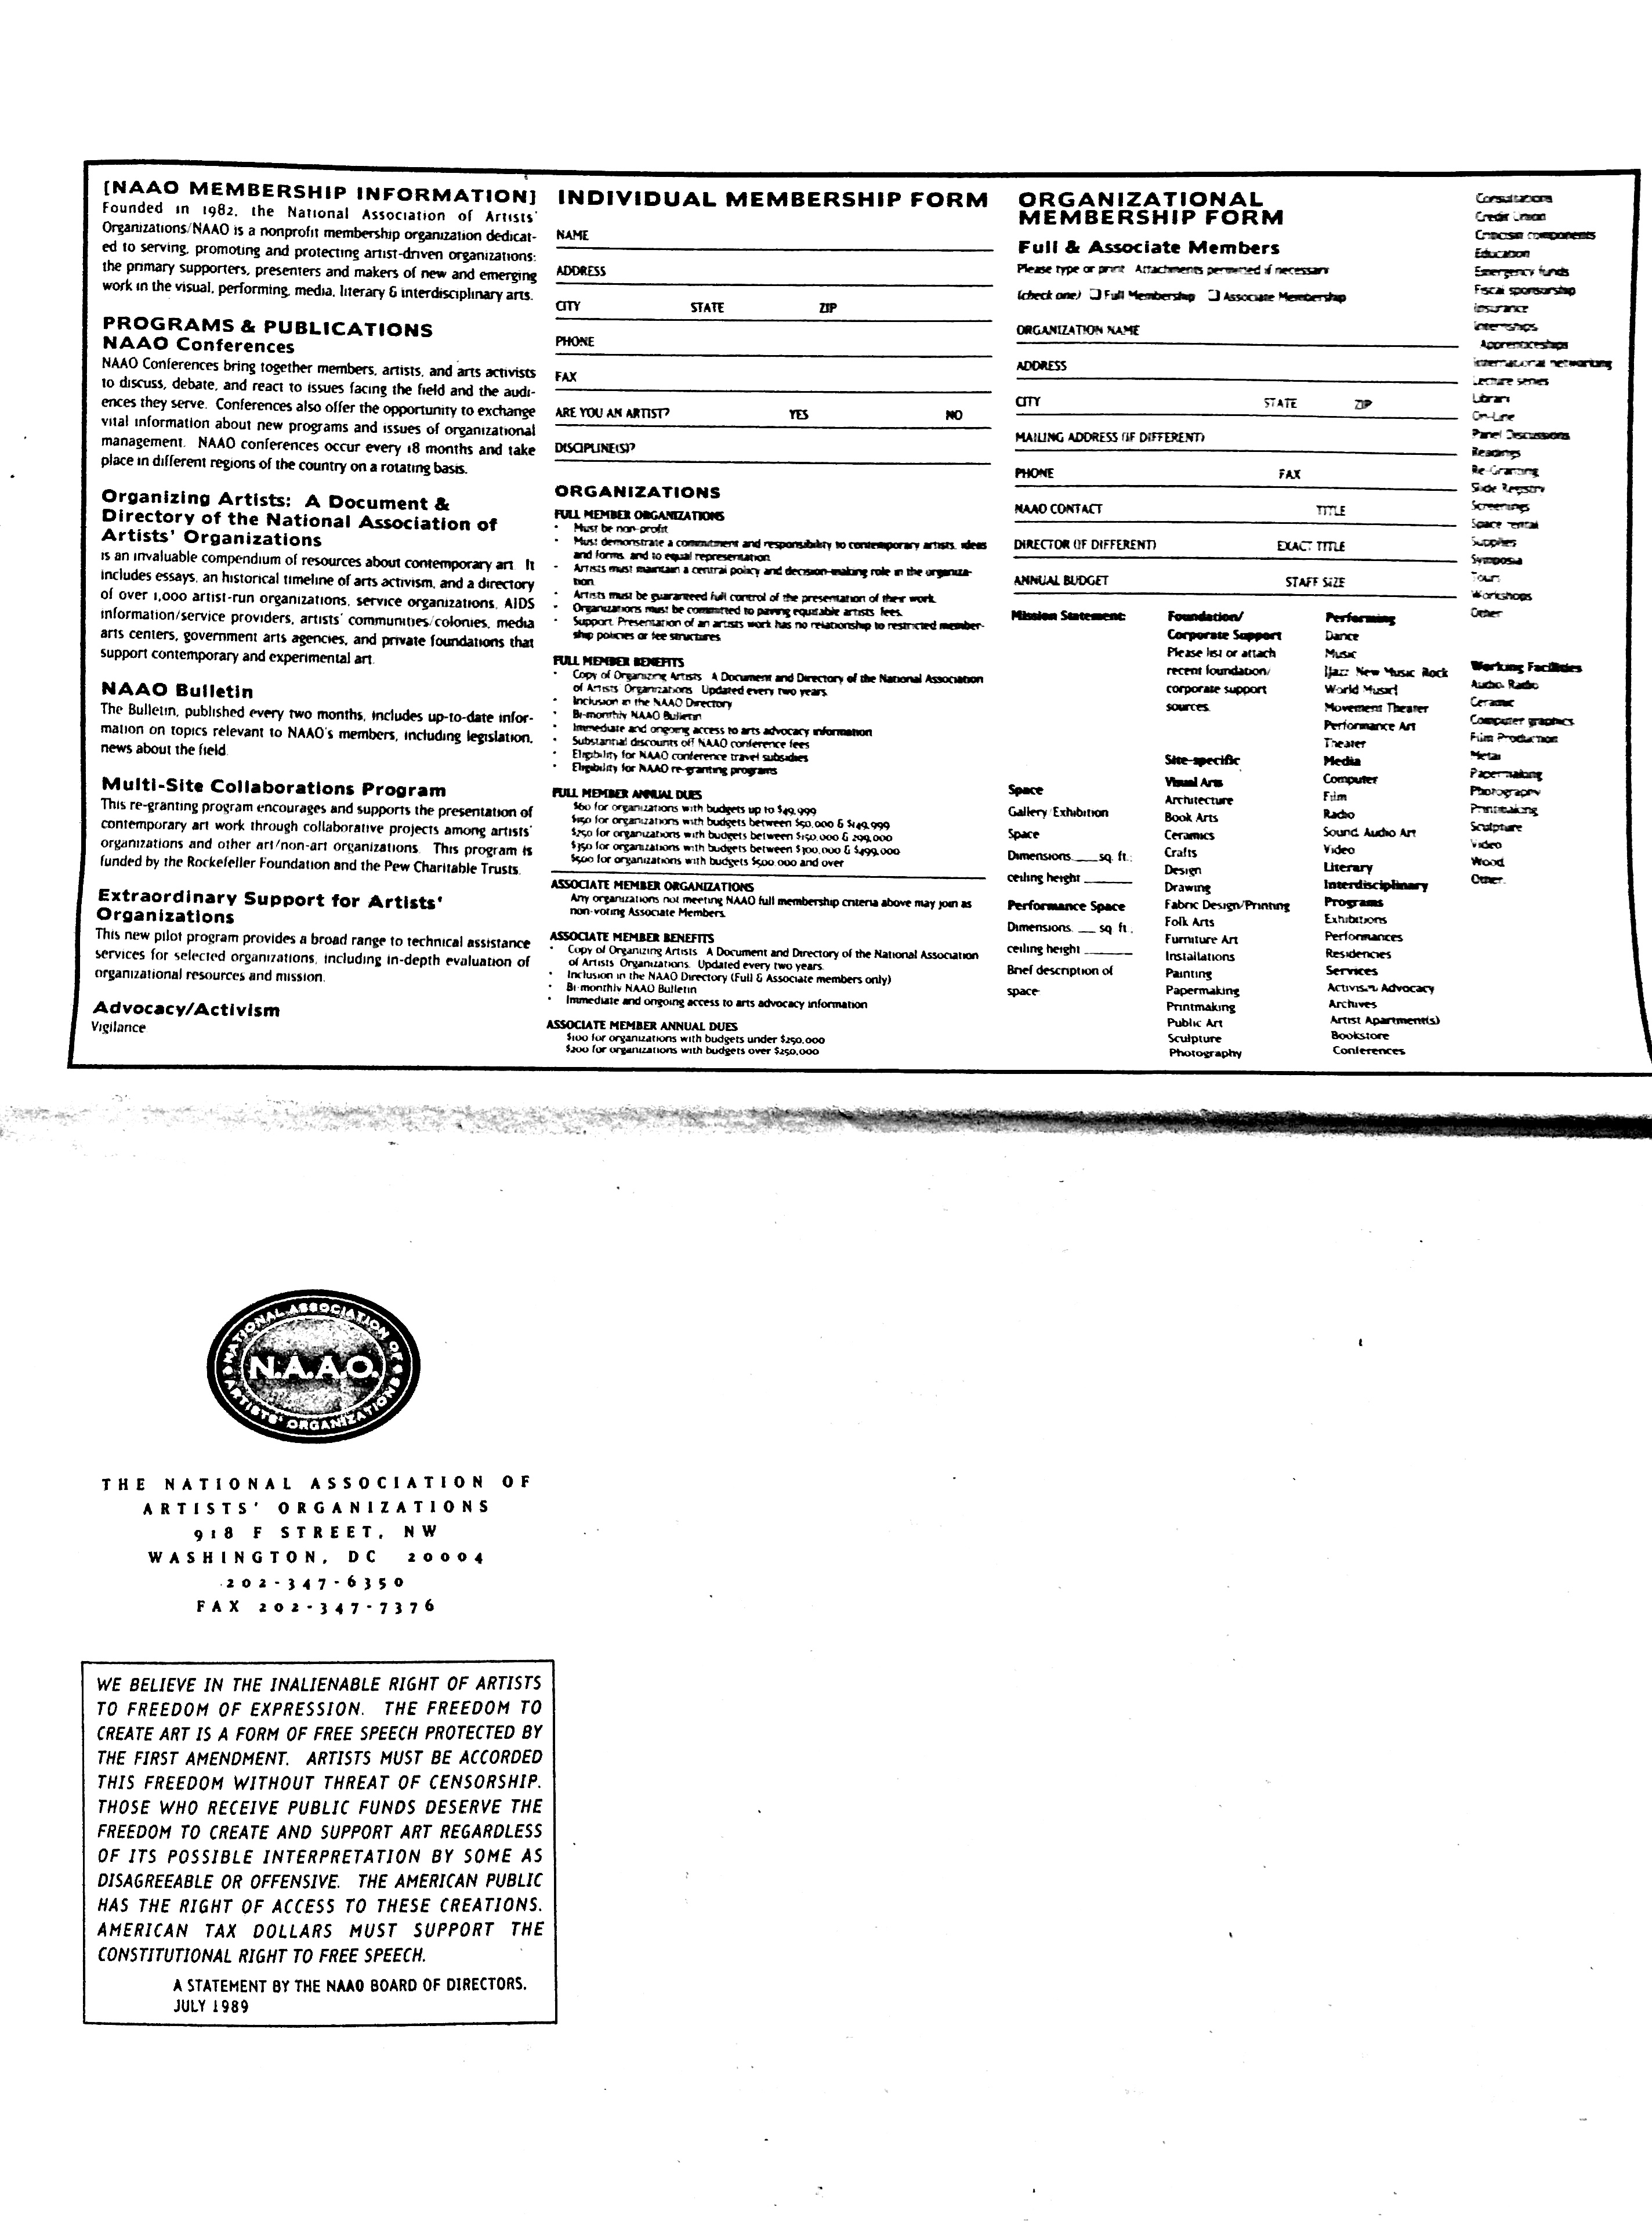 February 1993 - NAAO Bulletin Page 20.jpg